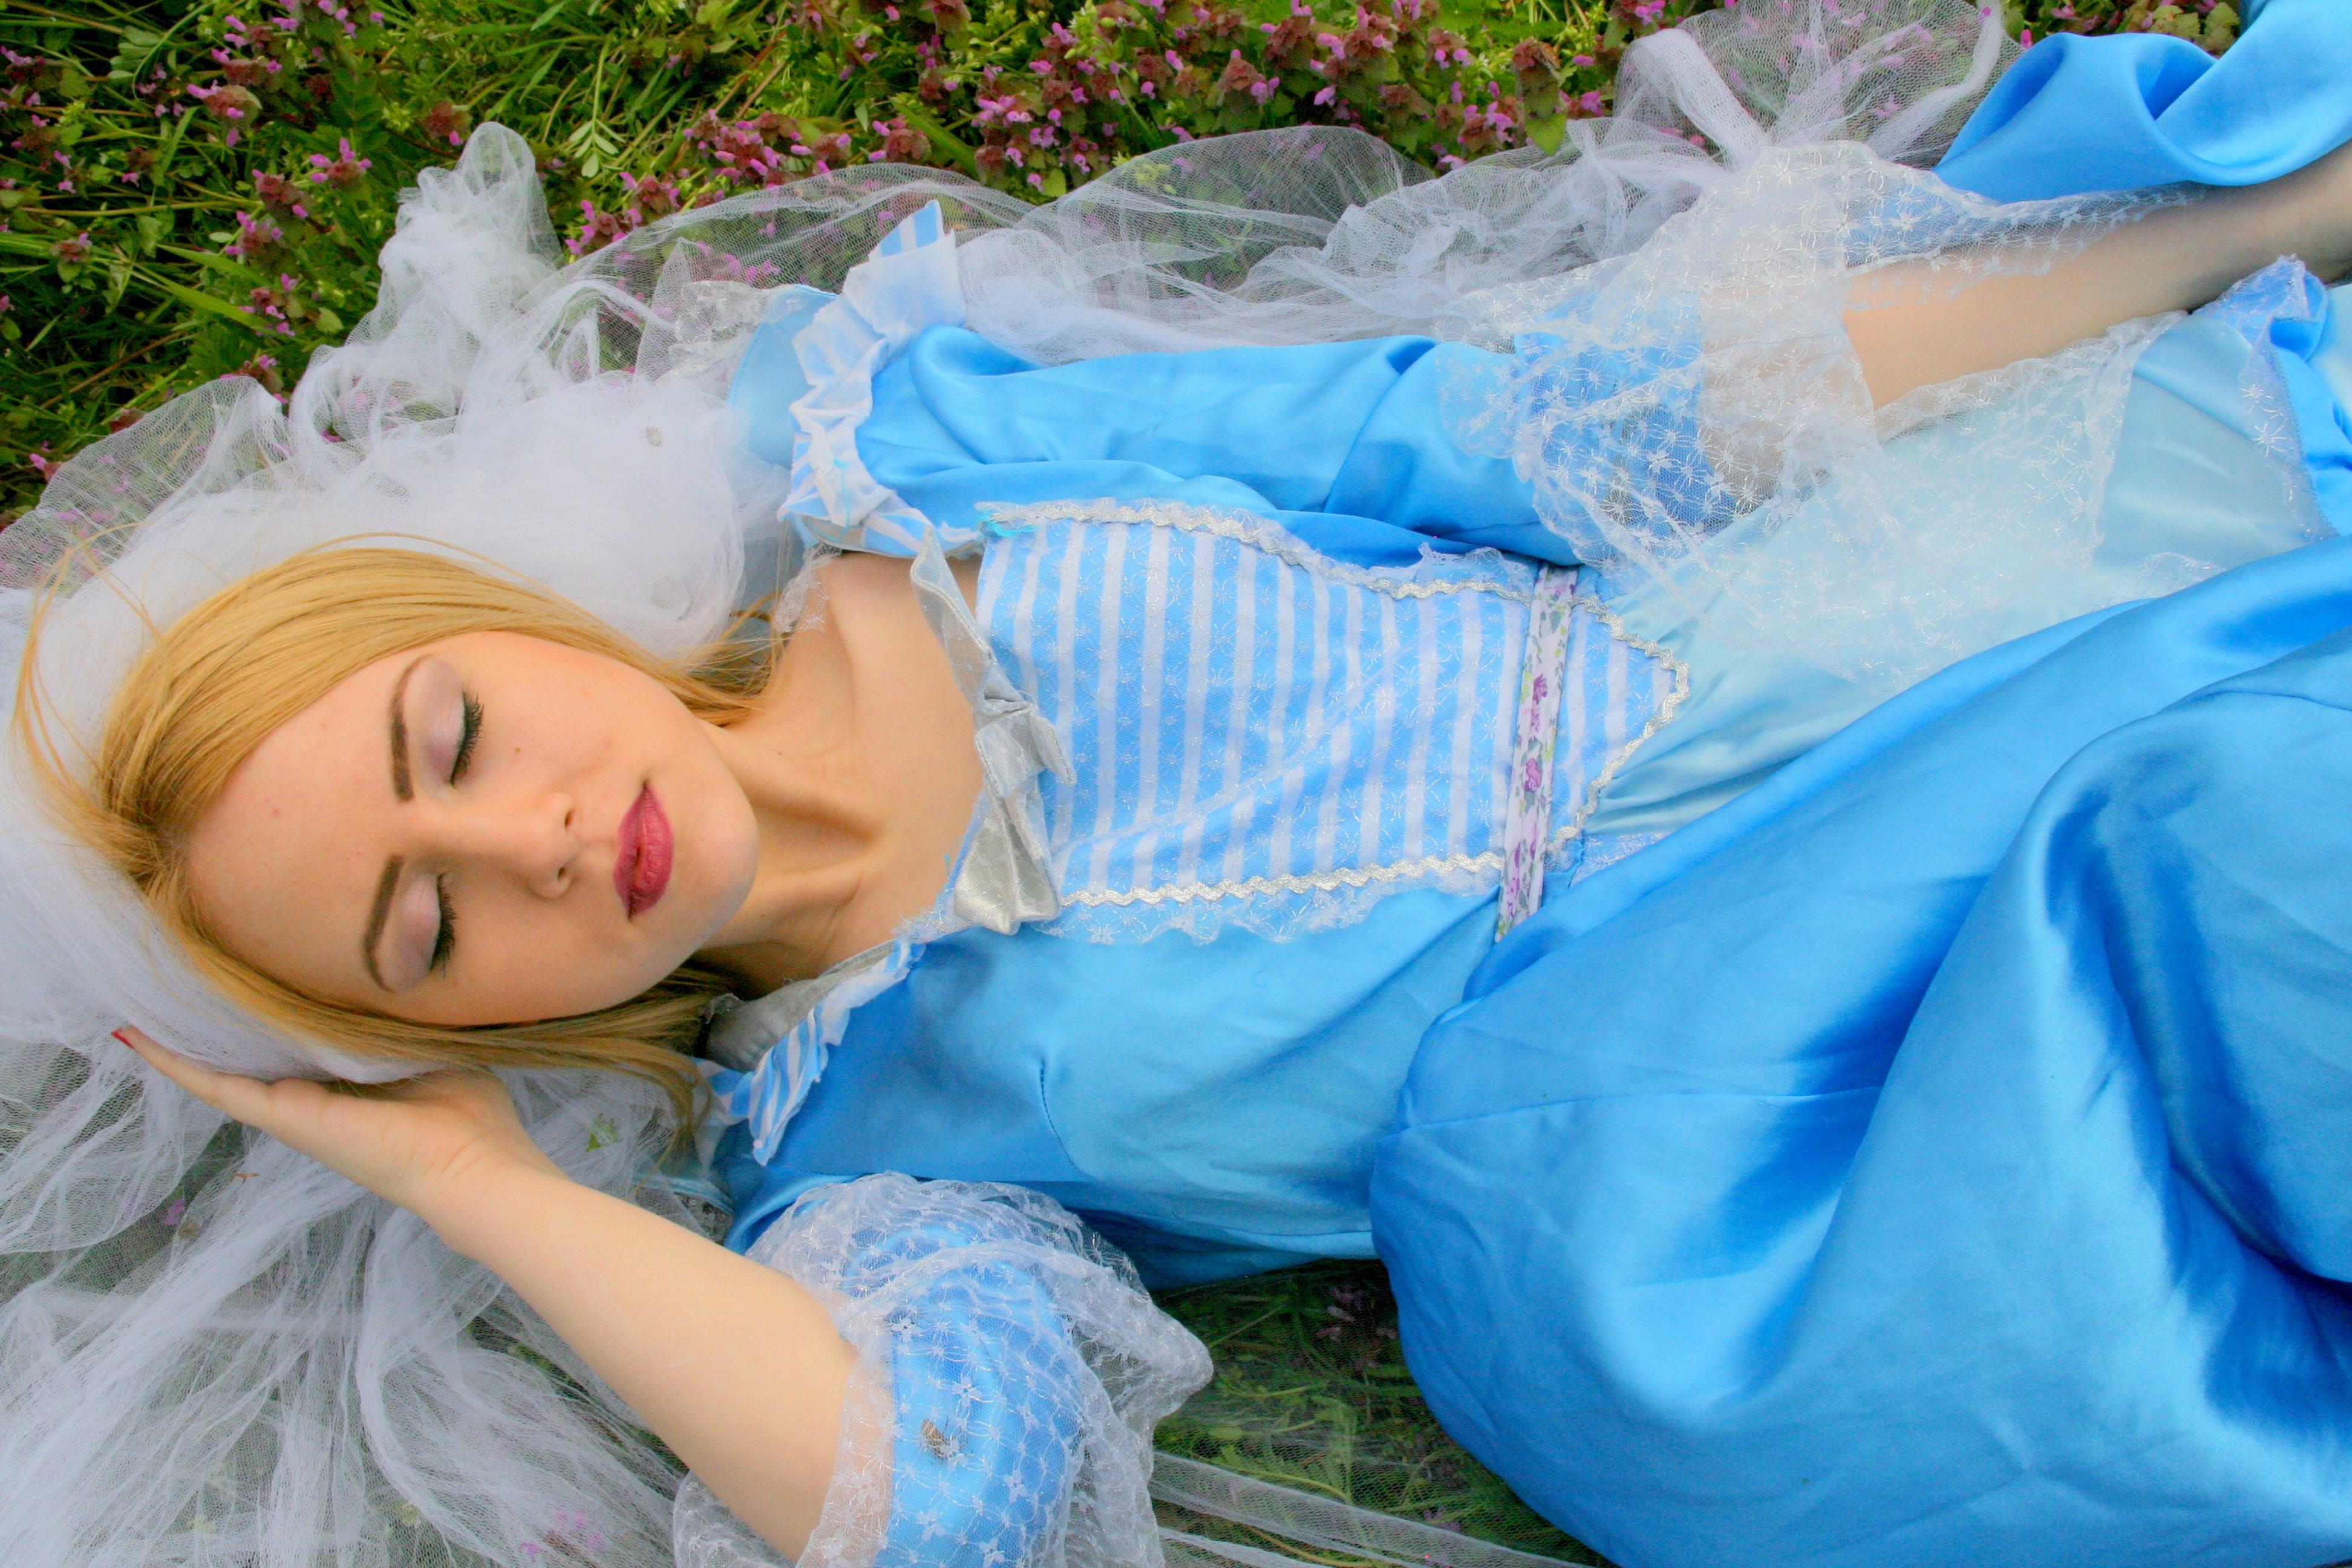 Sleeping Beauty, Activity, Blue, Girl, Human, HQ Photo